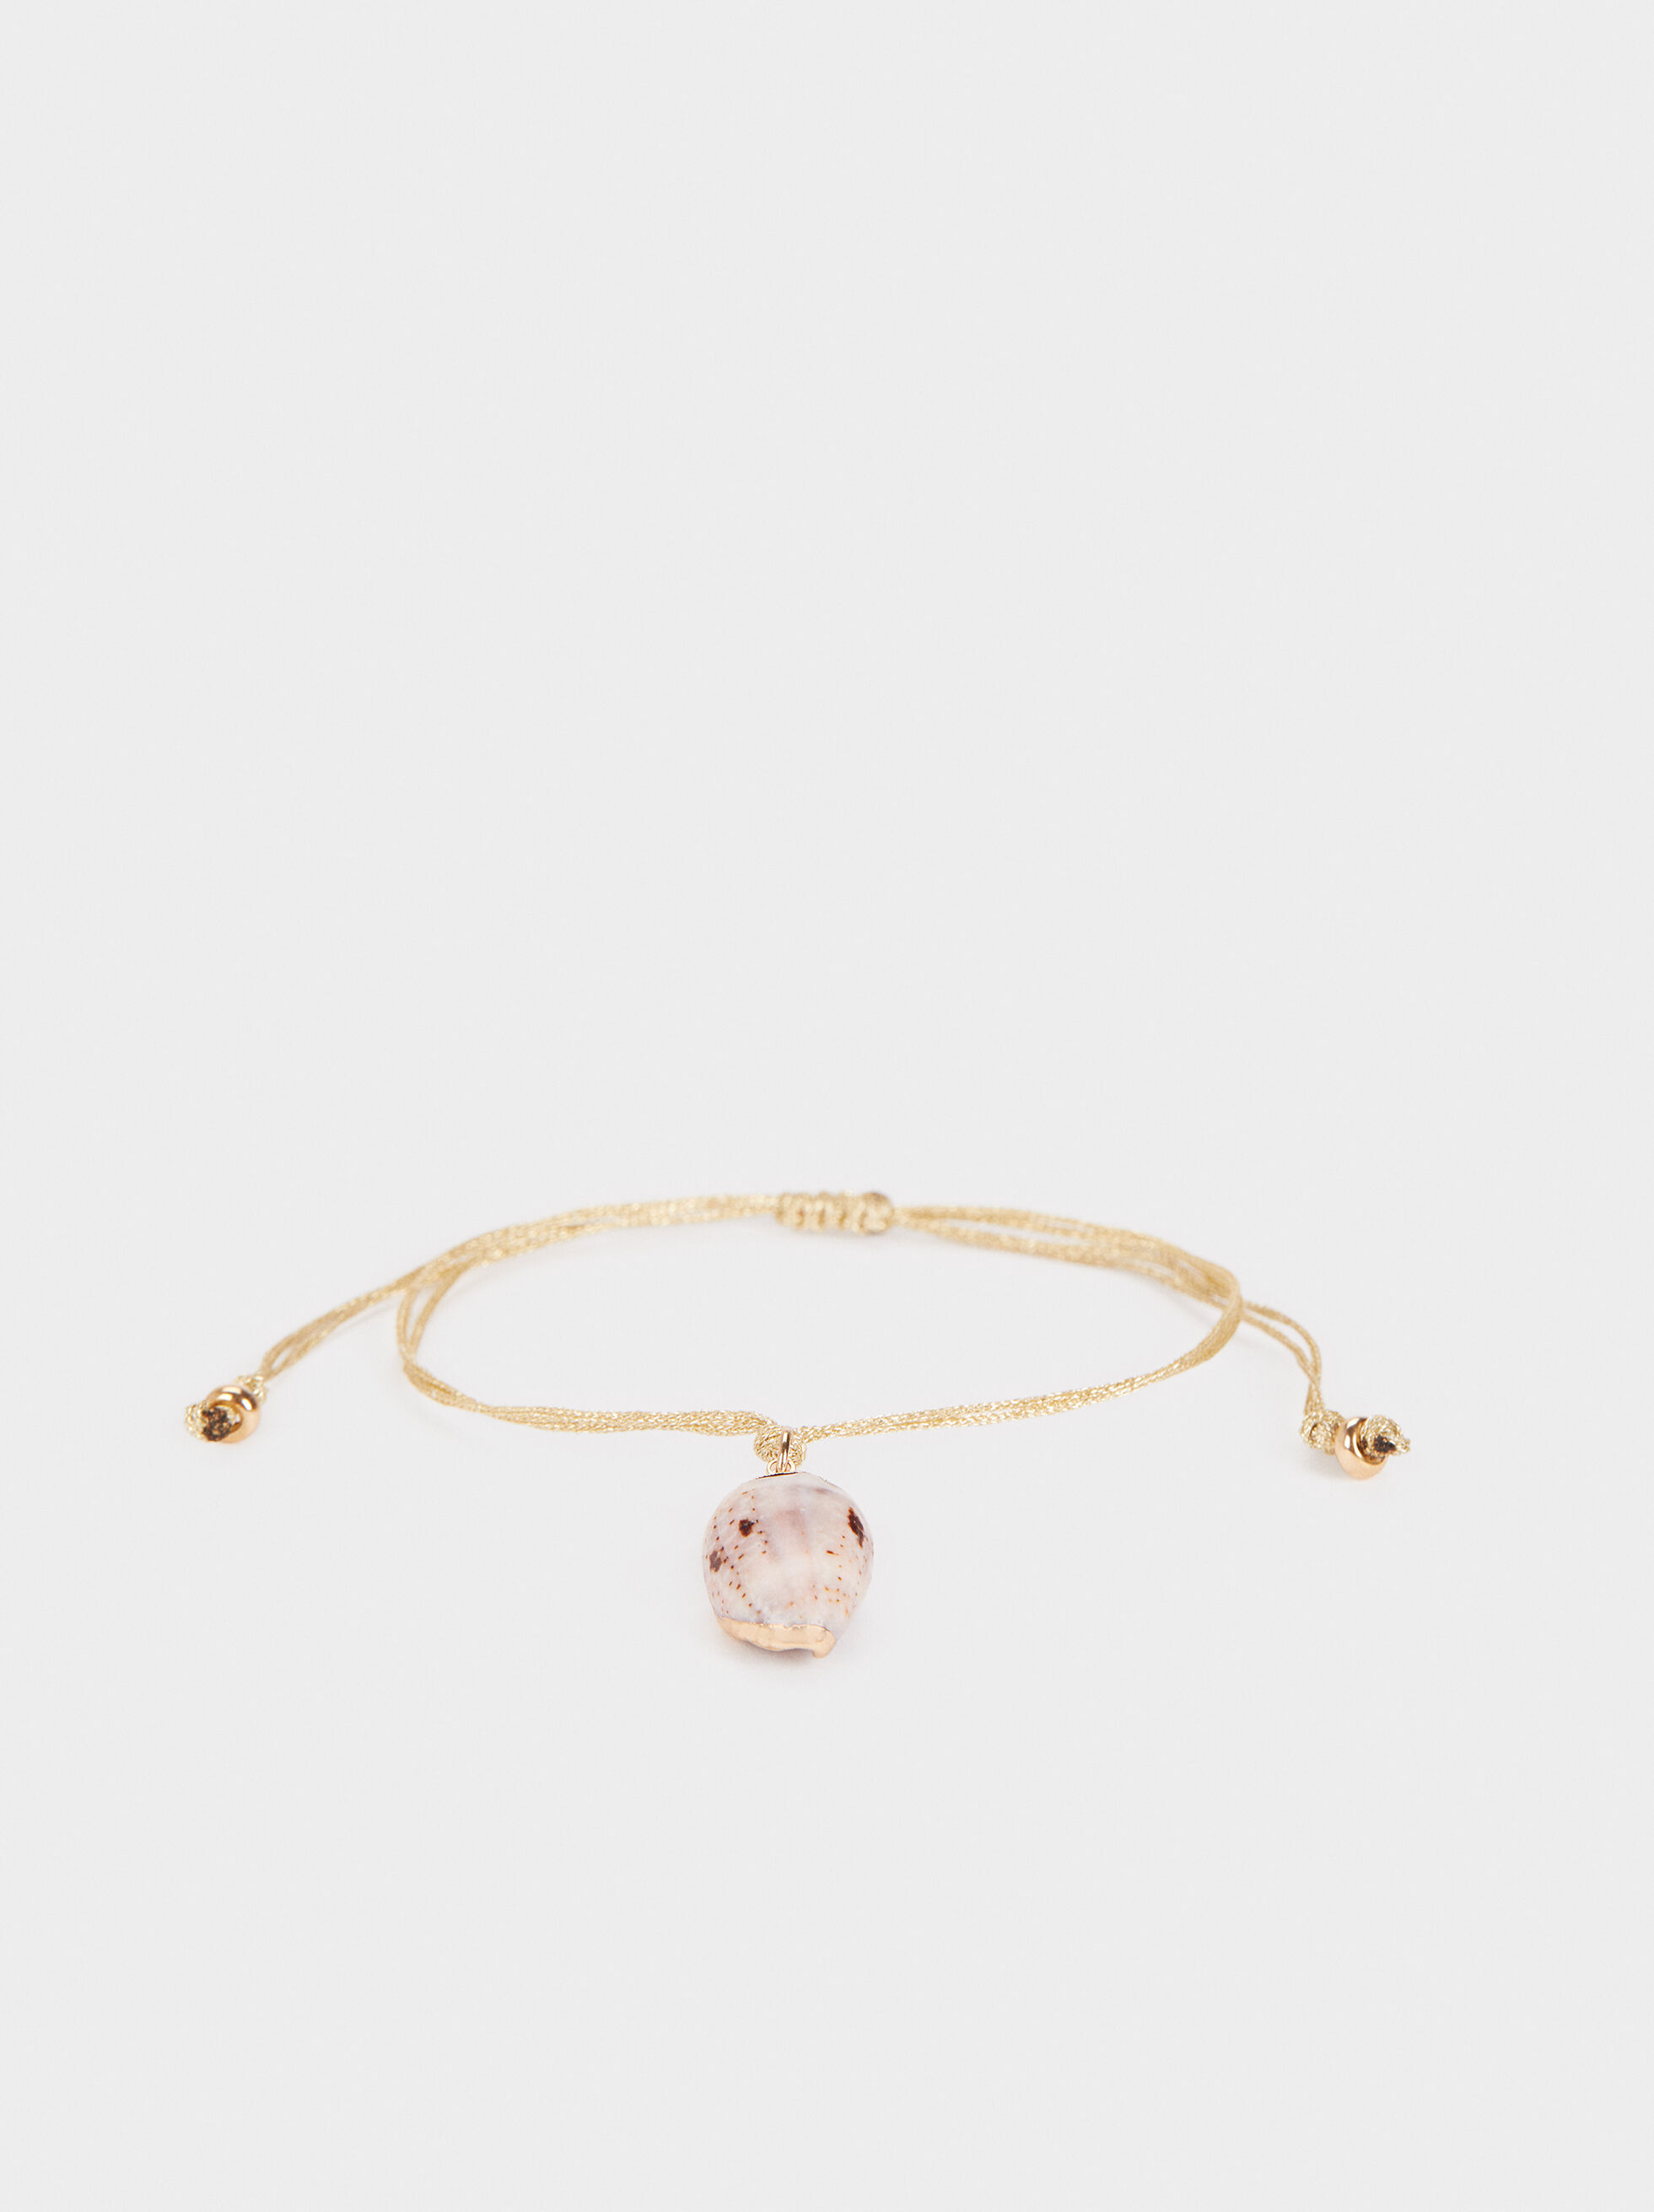 Gold Anklet With Shell, Golden, hi-res